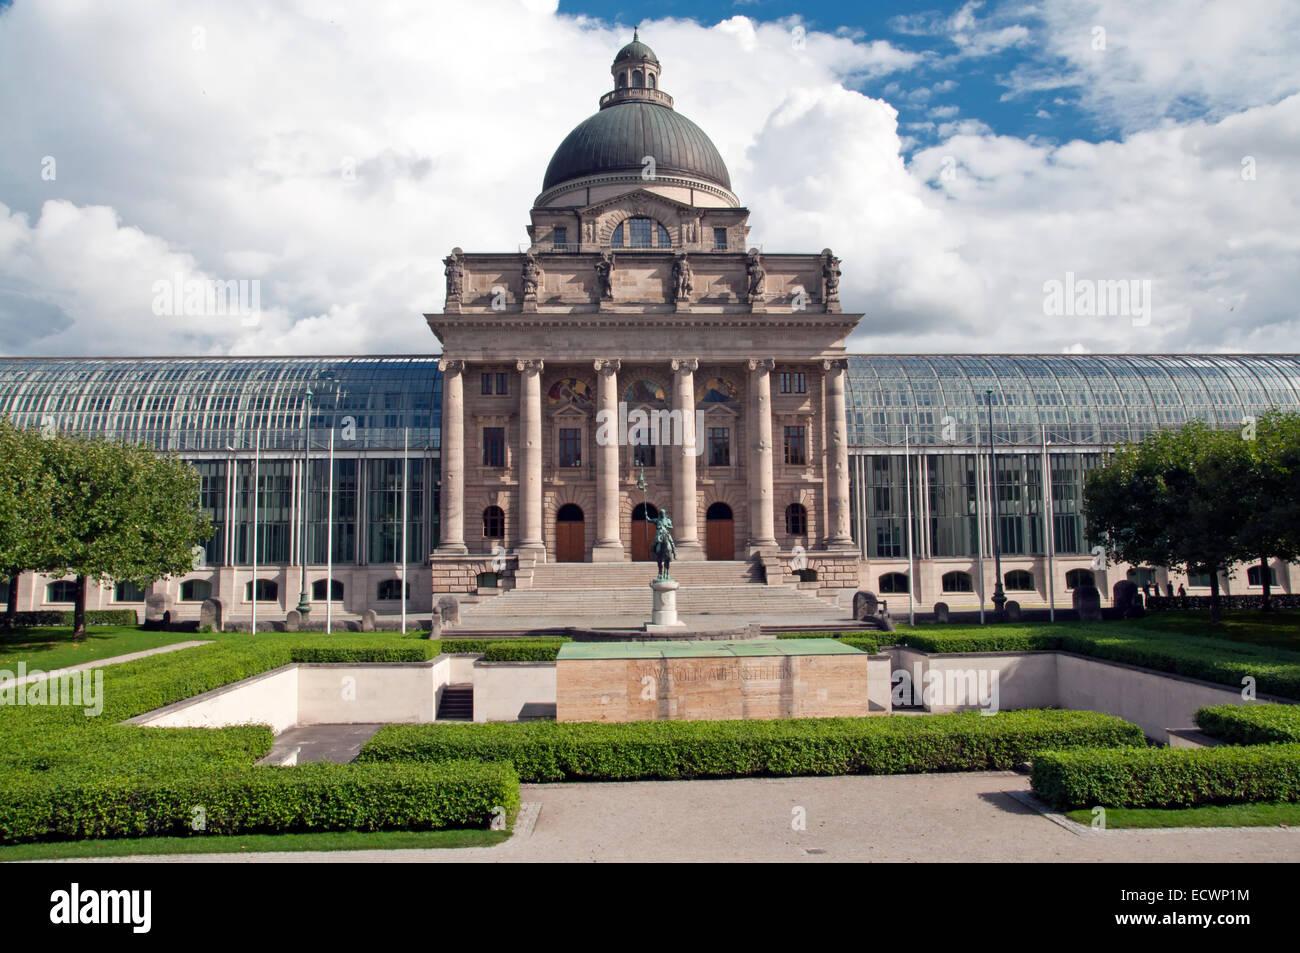 The historic state chancellery Bayerische Staatskanzlei of Munich in Bavaria - Stock Image